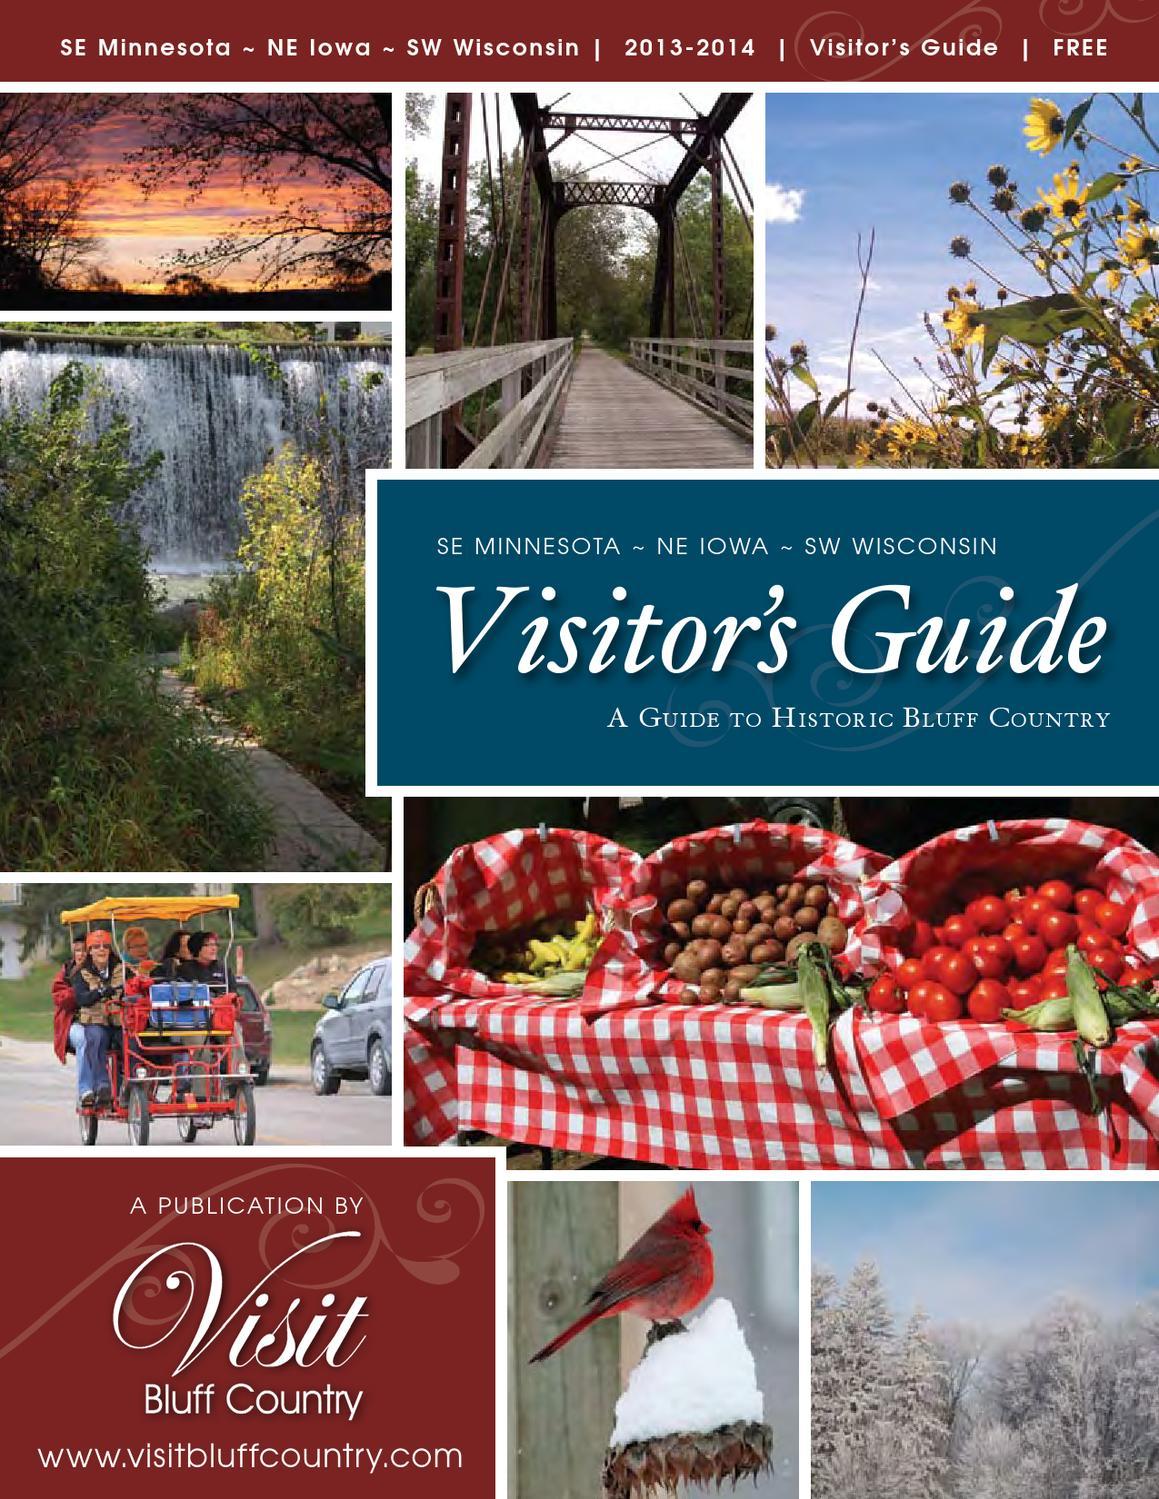 Visitors Guide 2013 By Visit Bluff Country Issuu Diamond Plain Fresh Milk 949 Ml